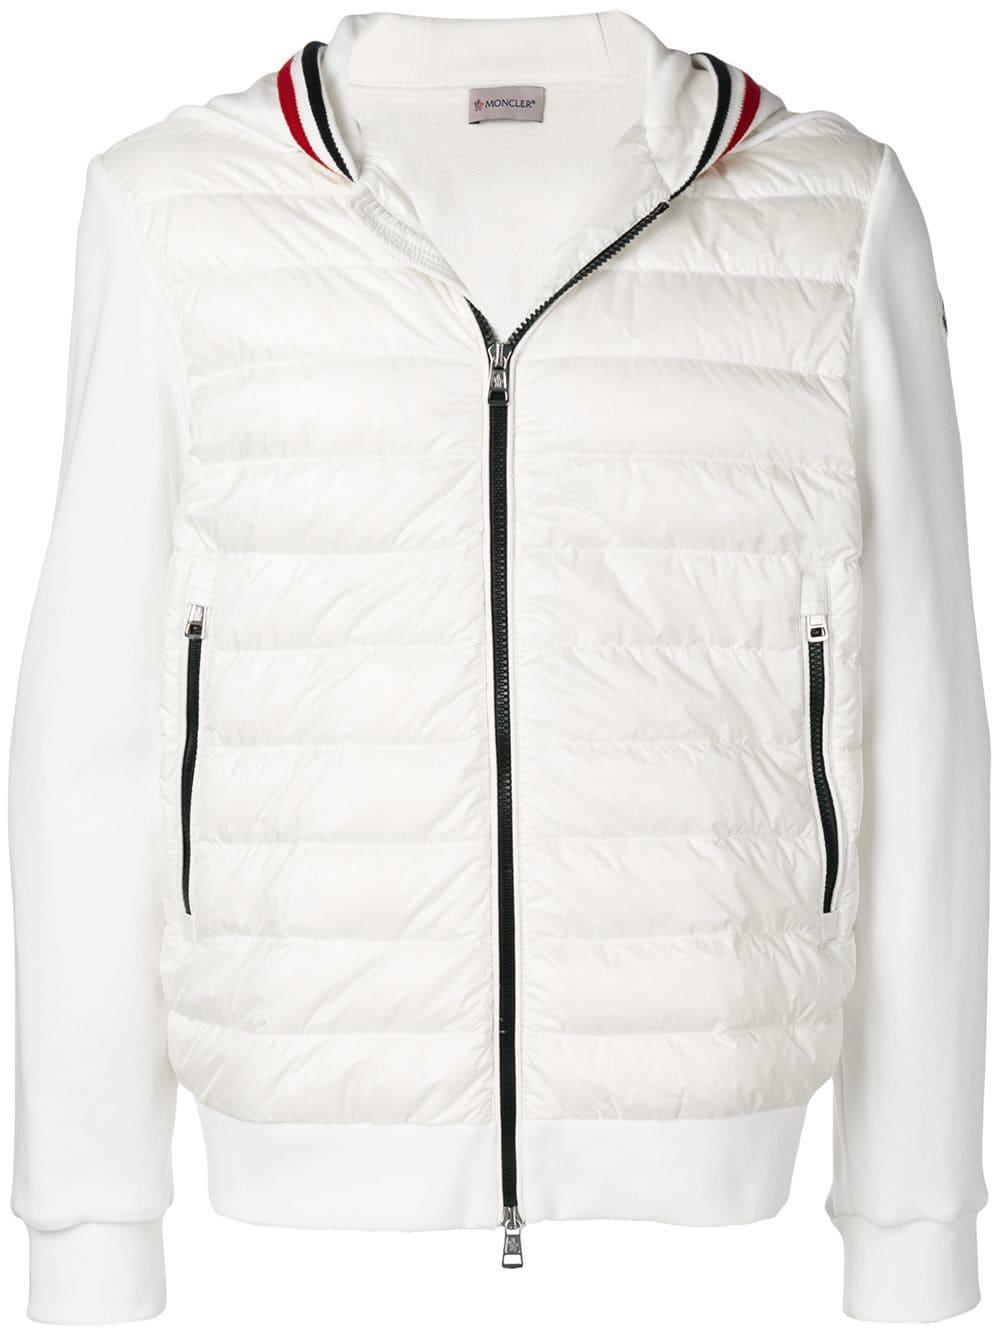 1e73e7dec MONCLER MONCLER PADDED HOODIE - WHITE. #moncler #cloth | Moncler in ...